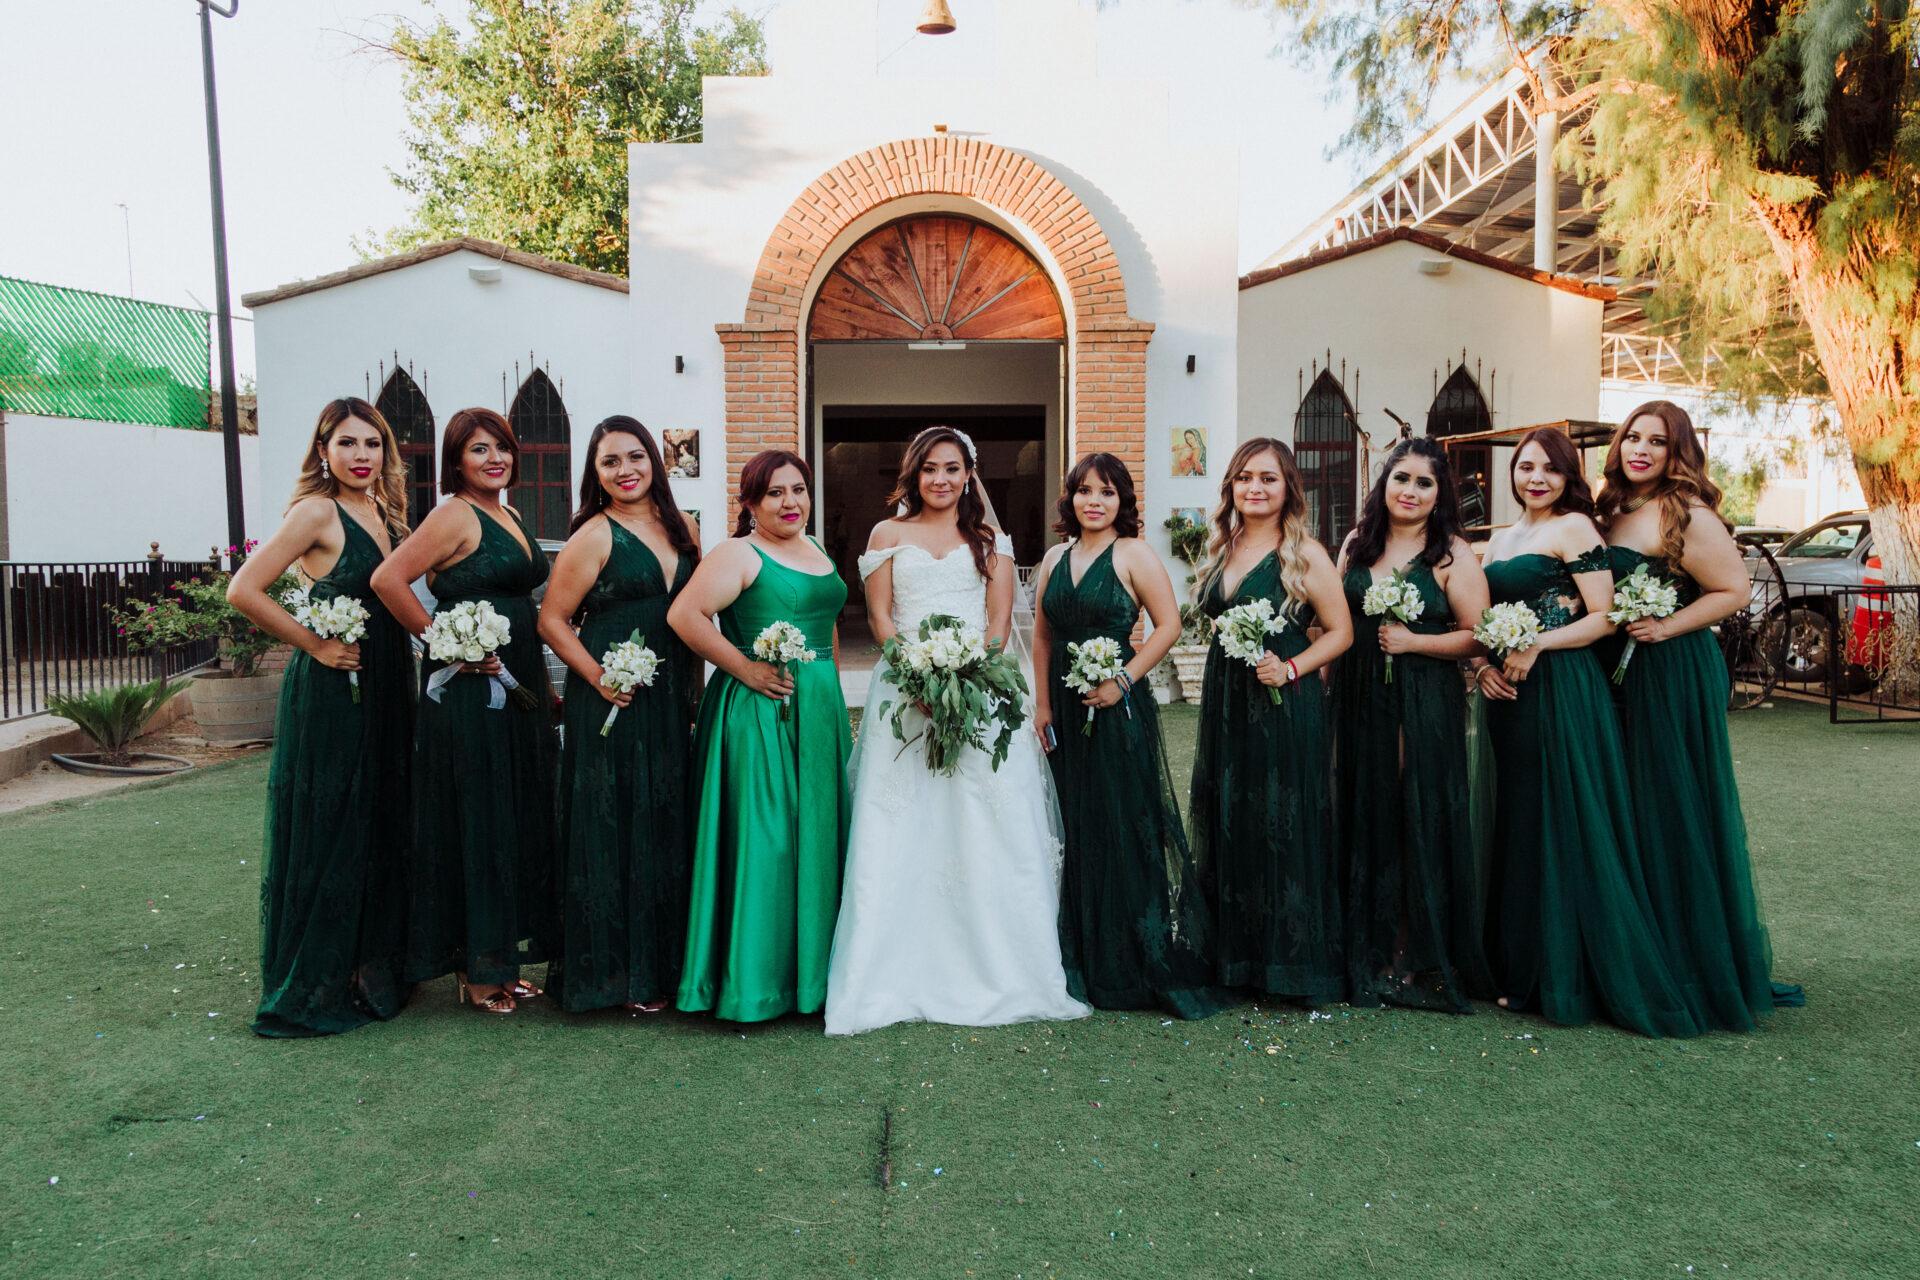 javier_noriega_fotografo_bodas_torreon_coahuila_zacatecas_wedding_photographer36a